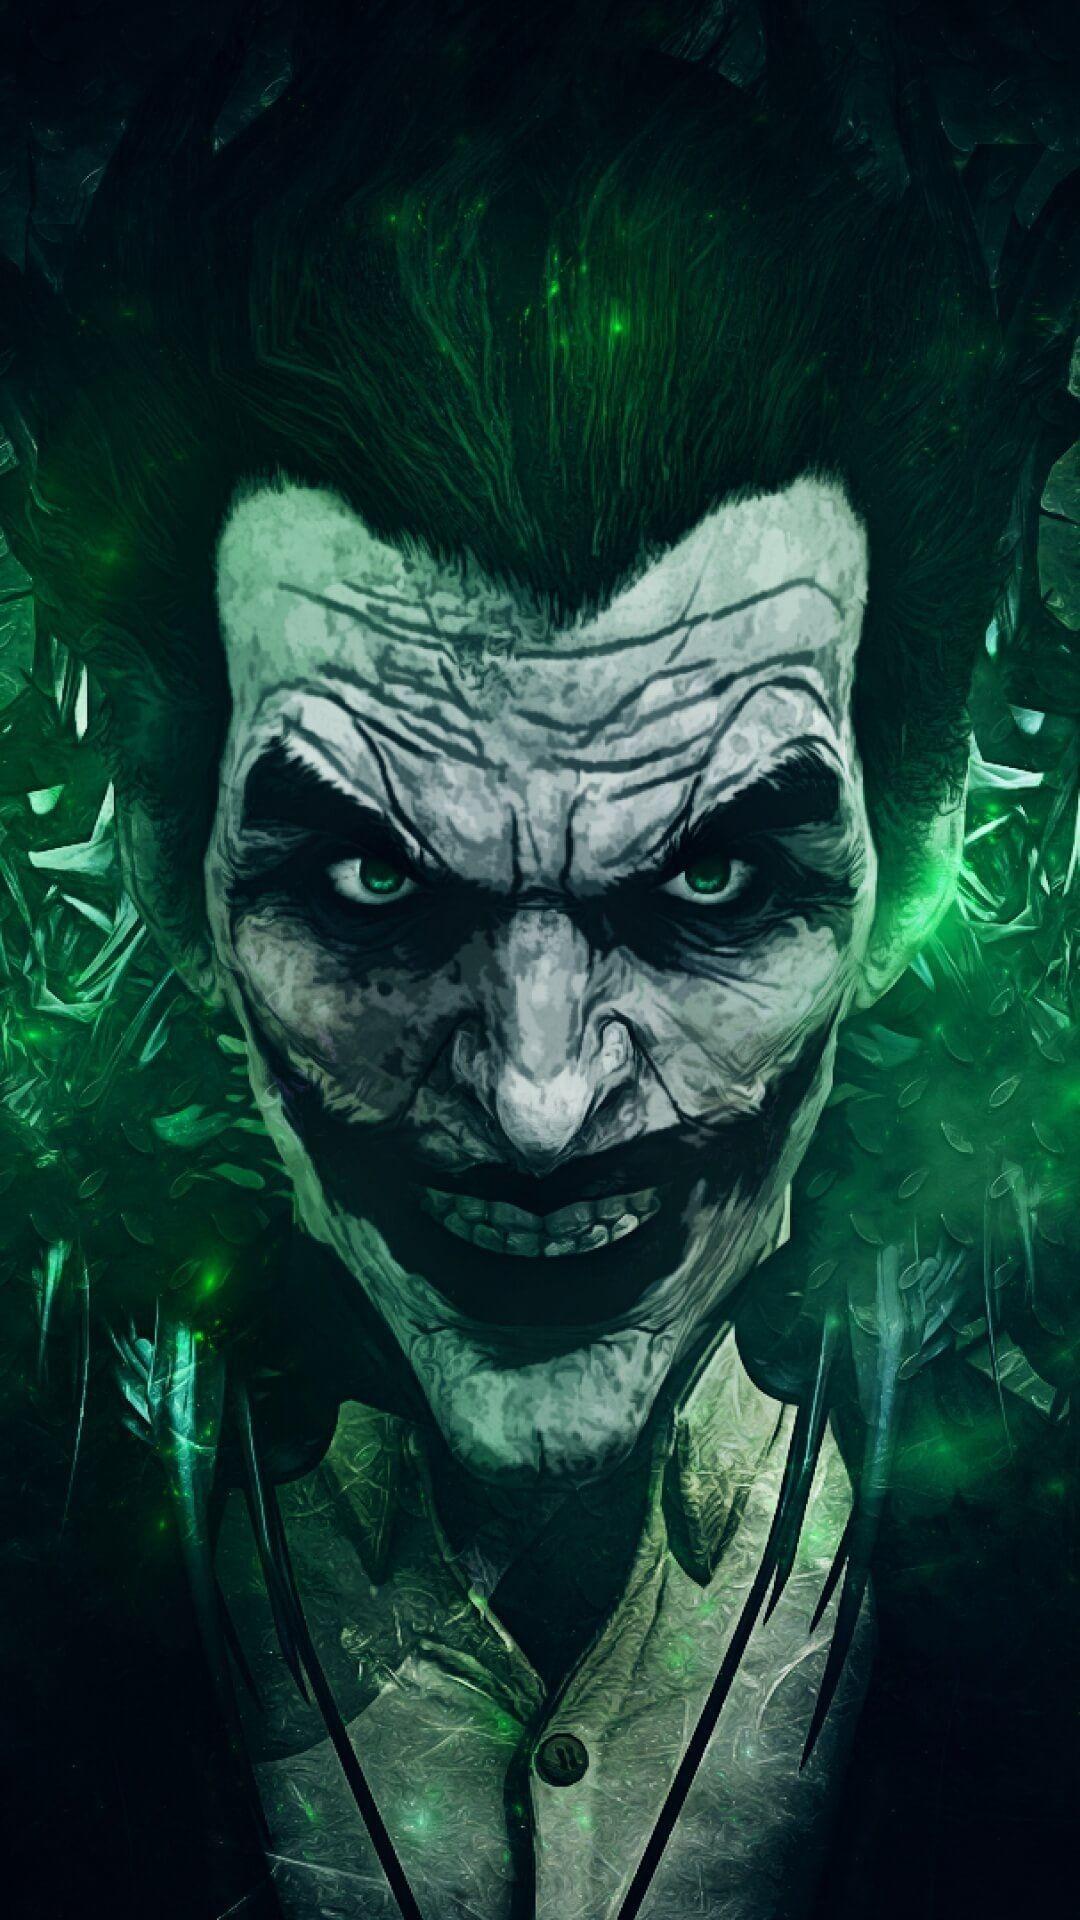 Harley And Joker Iphone Wallpapers Top Free Harley And Joker